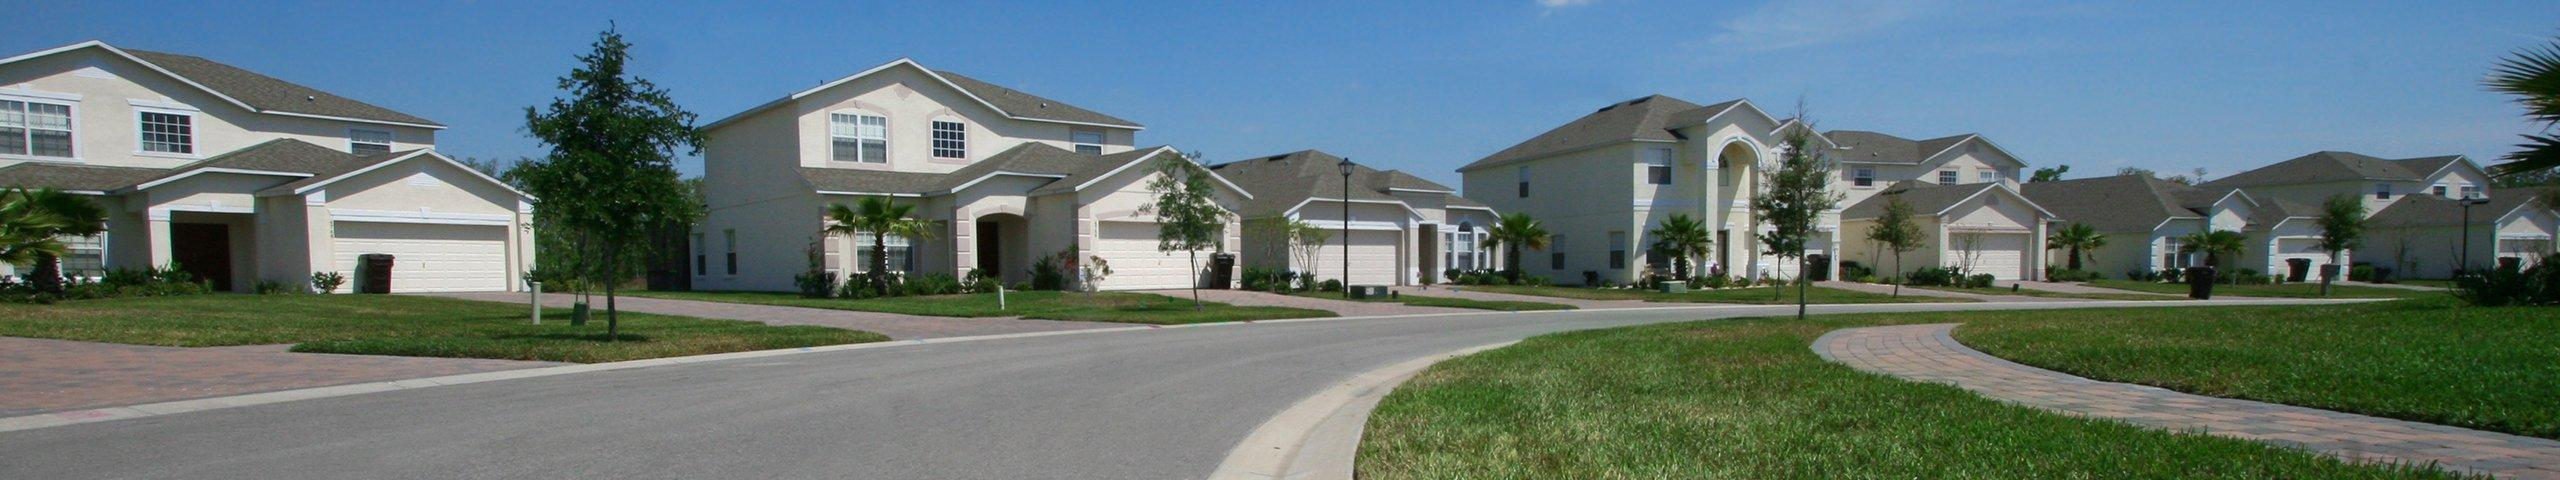 suburban neighborhood in jacksonville florida